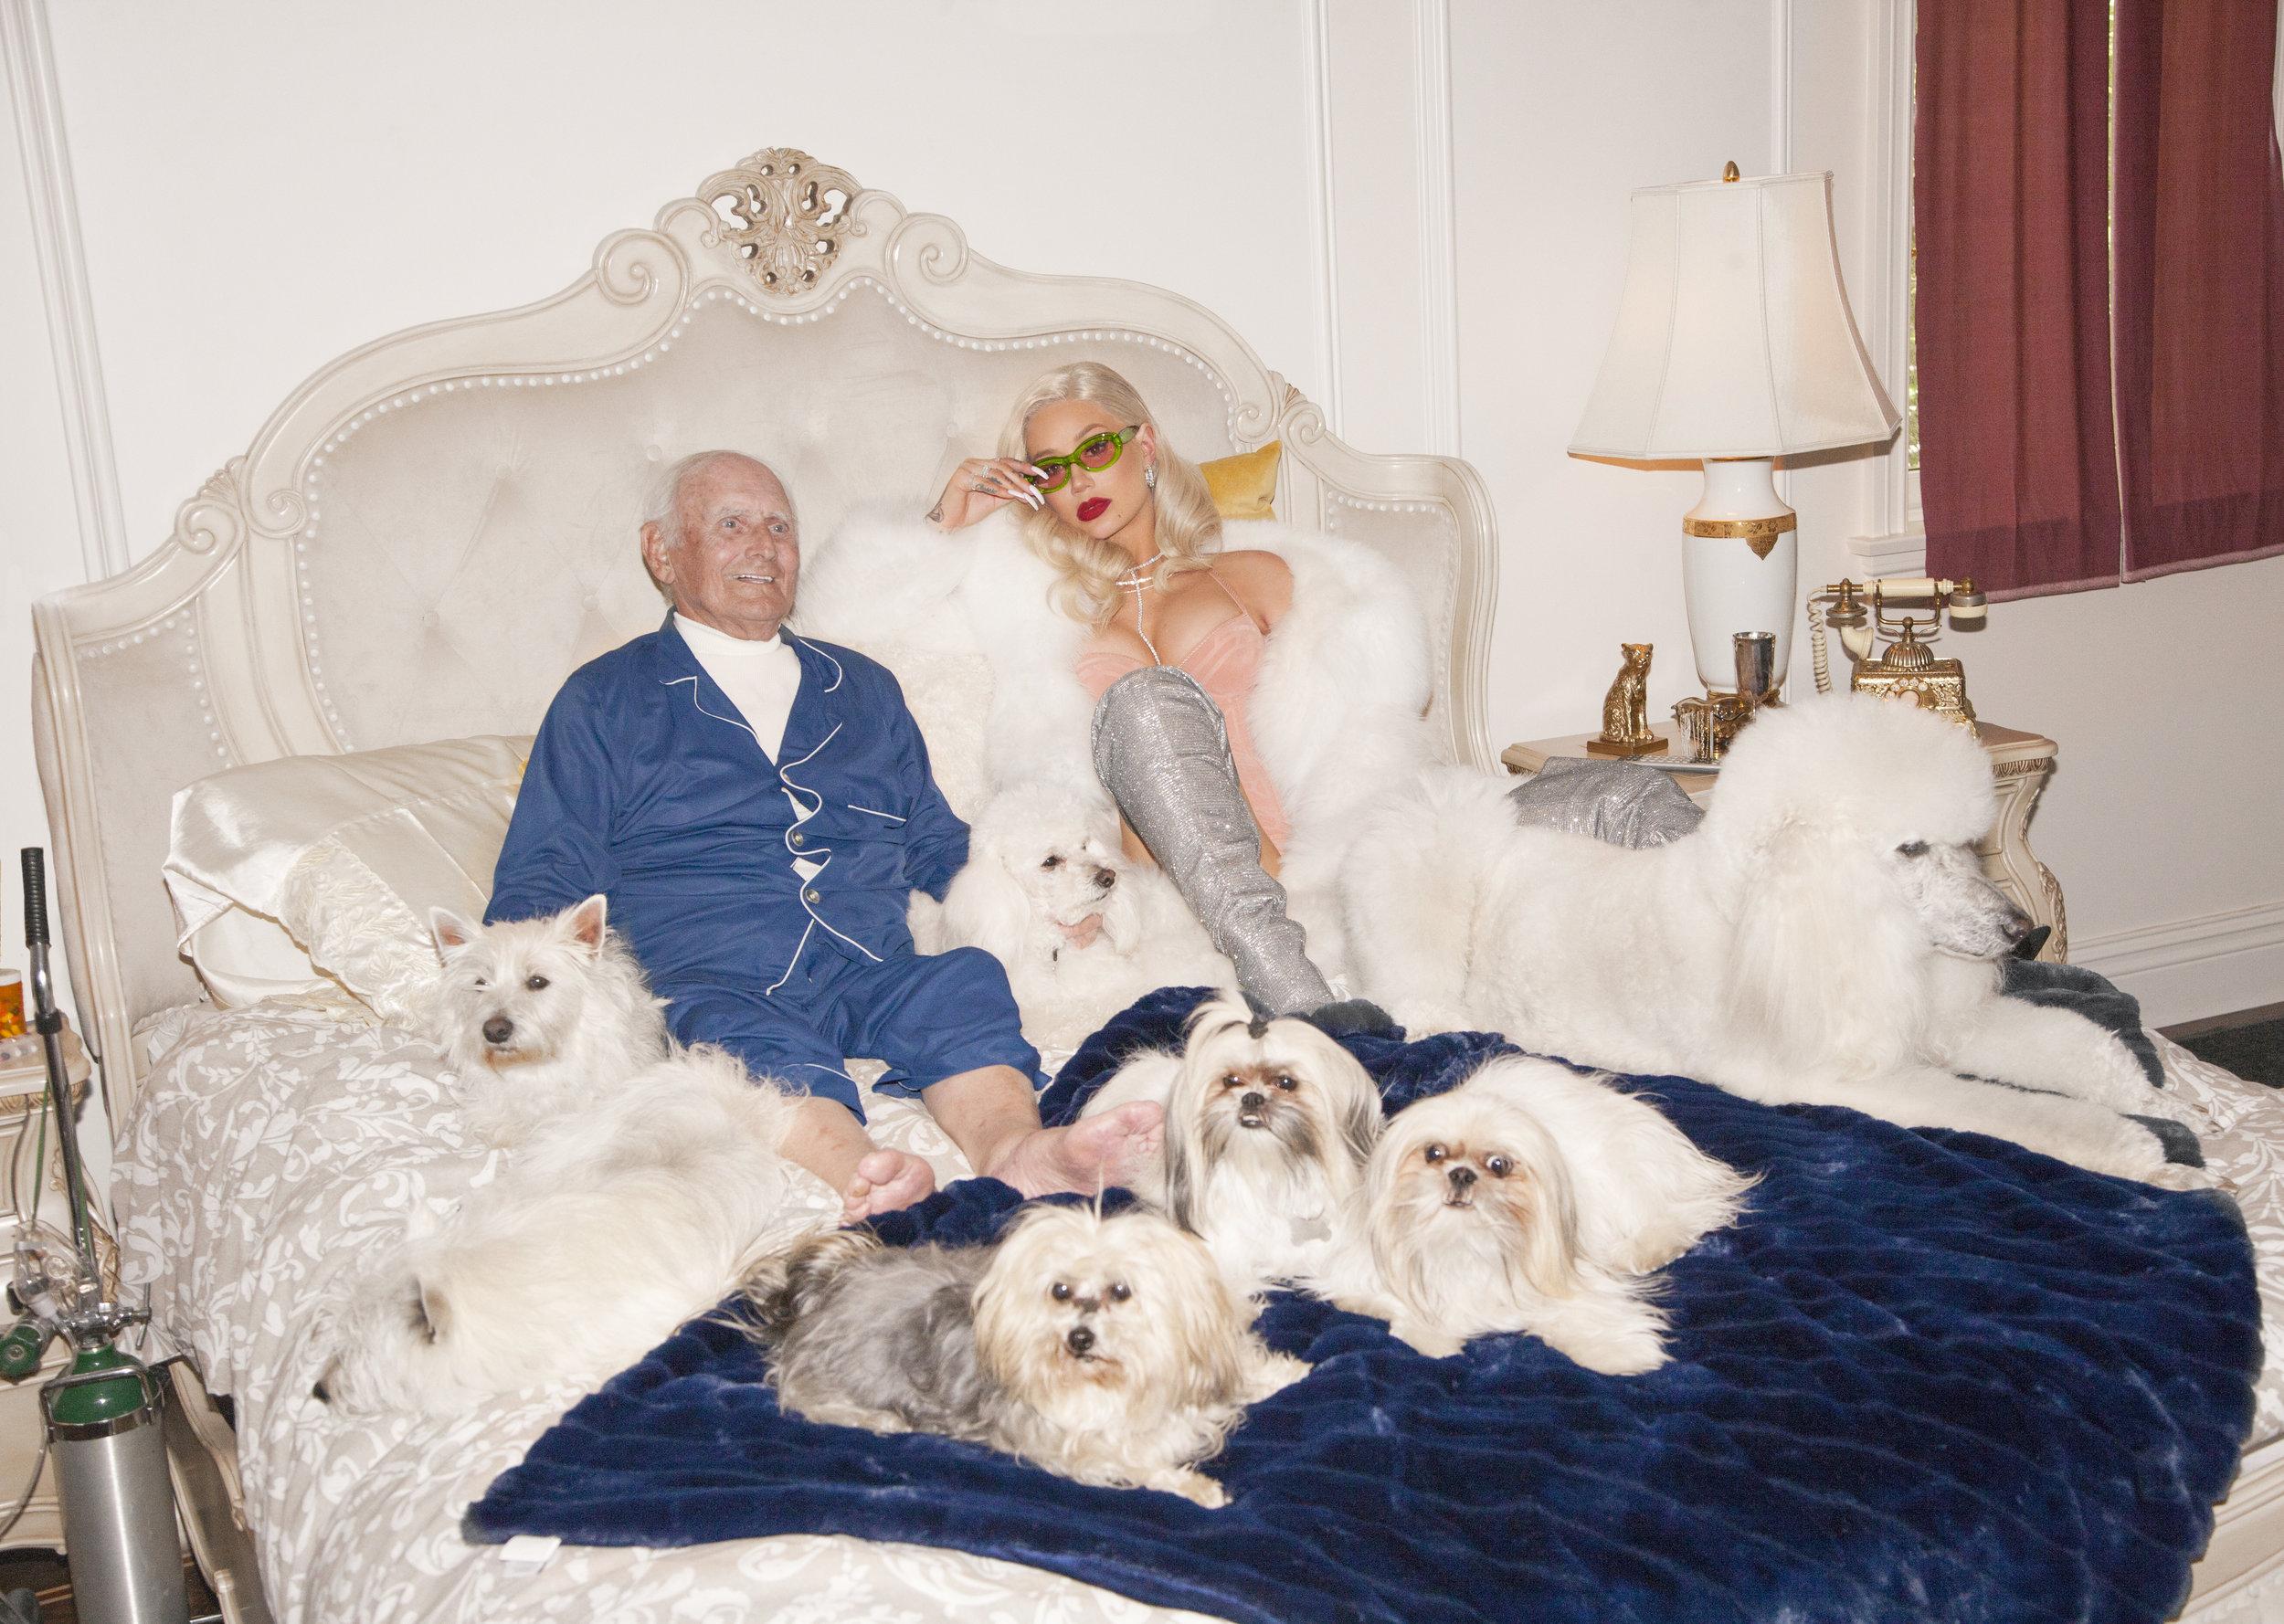 Thom Kerr Iggy Azalea Started Dogs